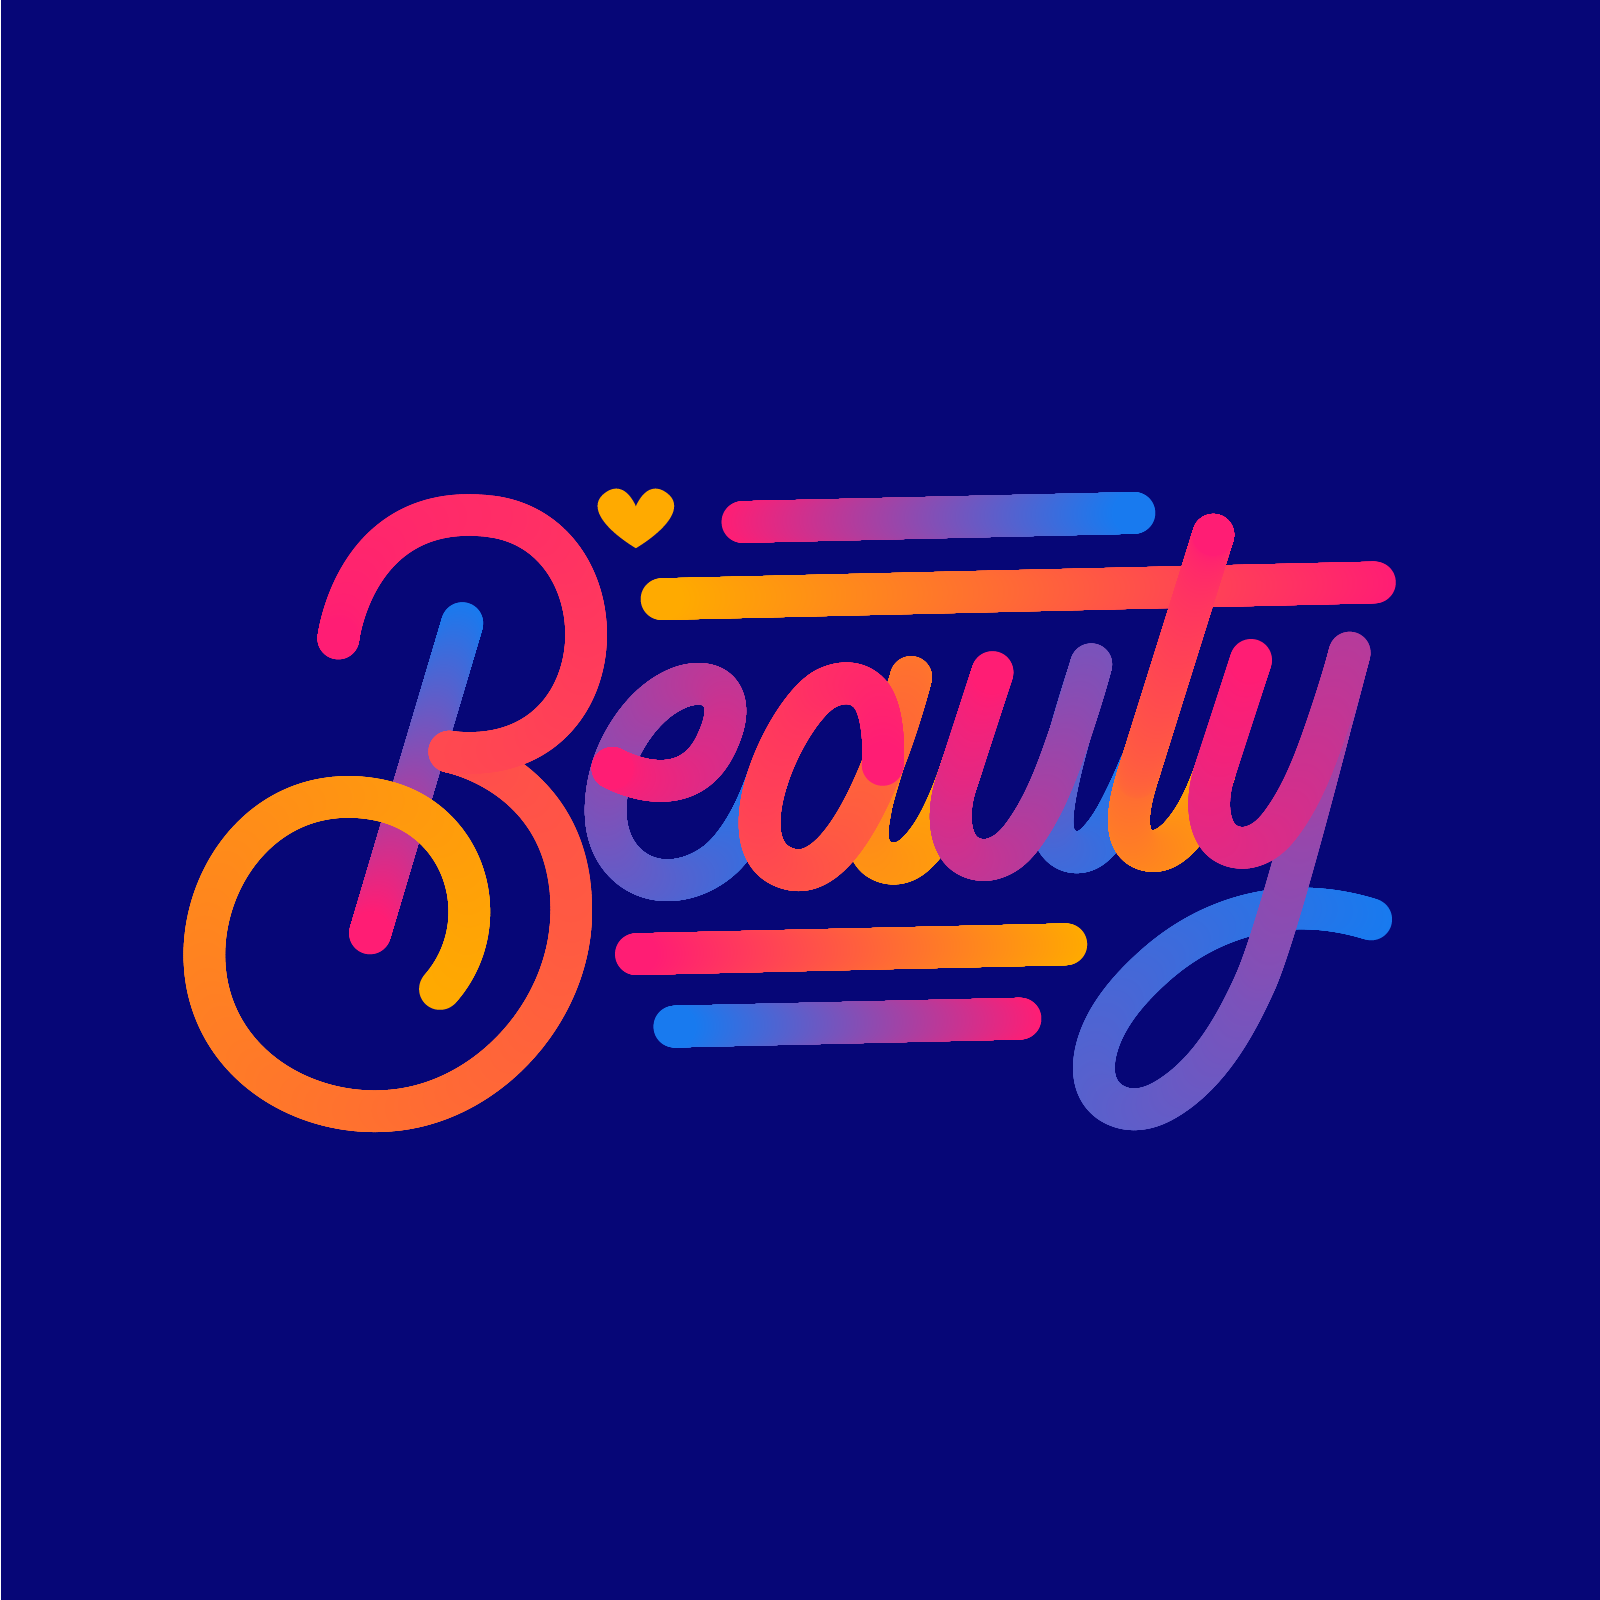 Beauty - José Manuel Jorge Cordero